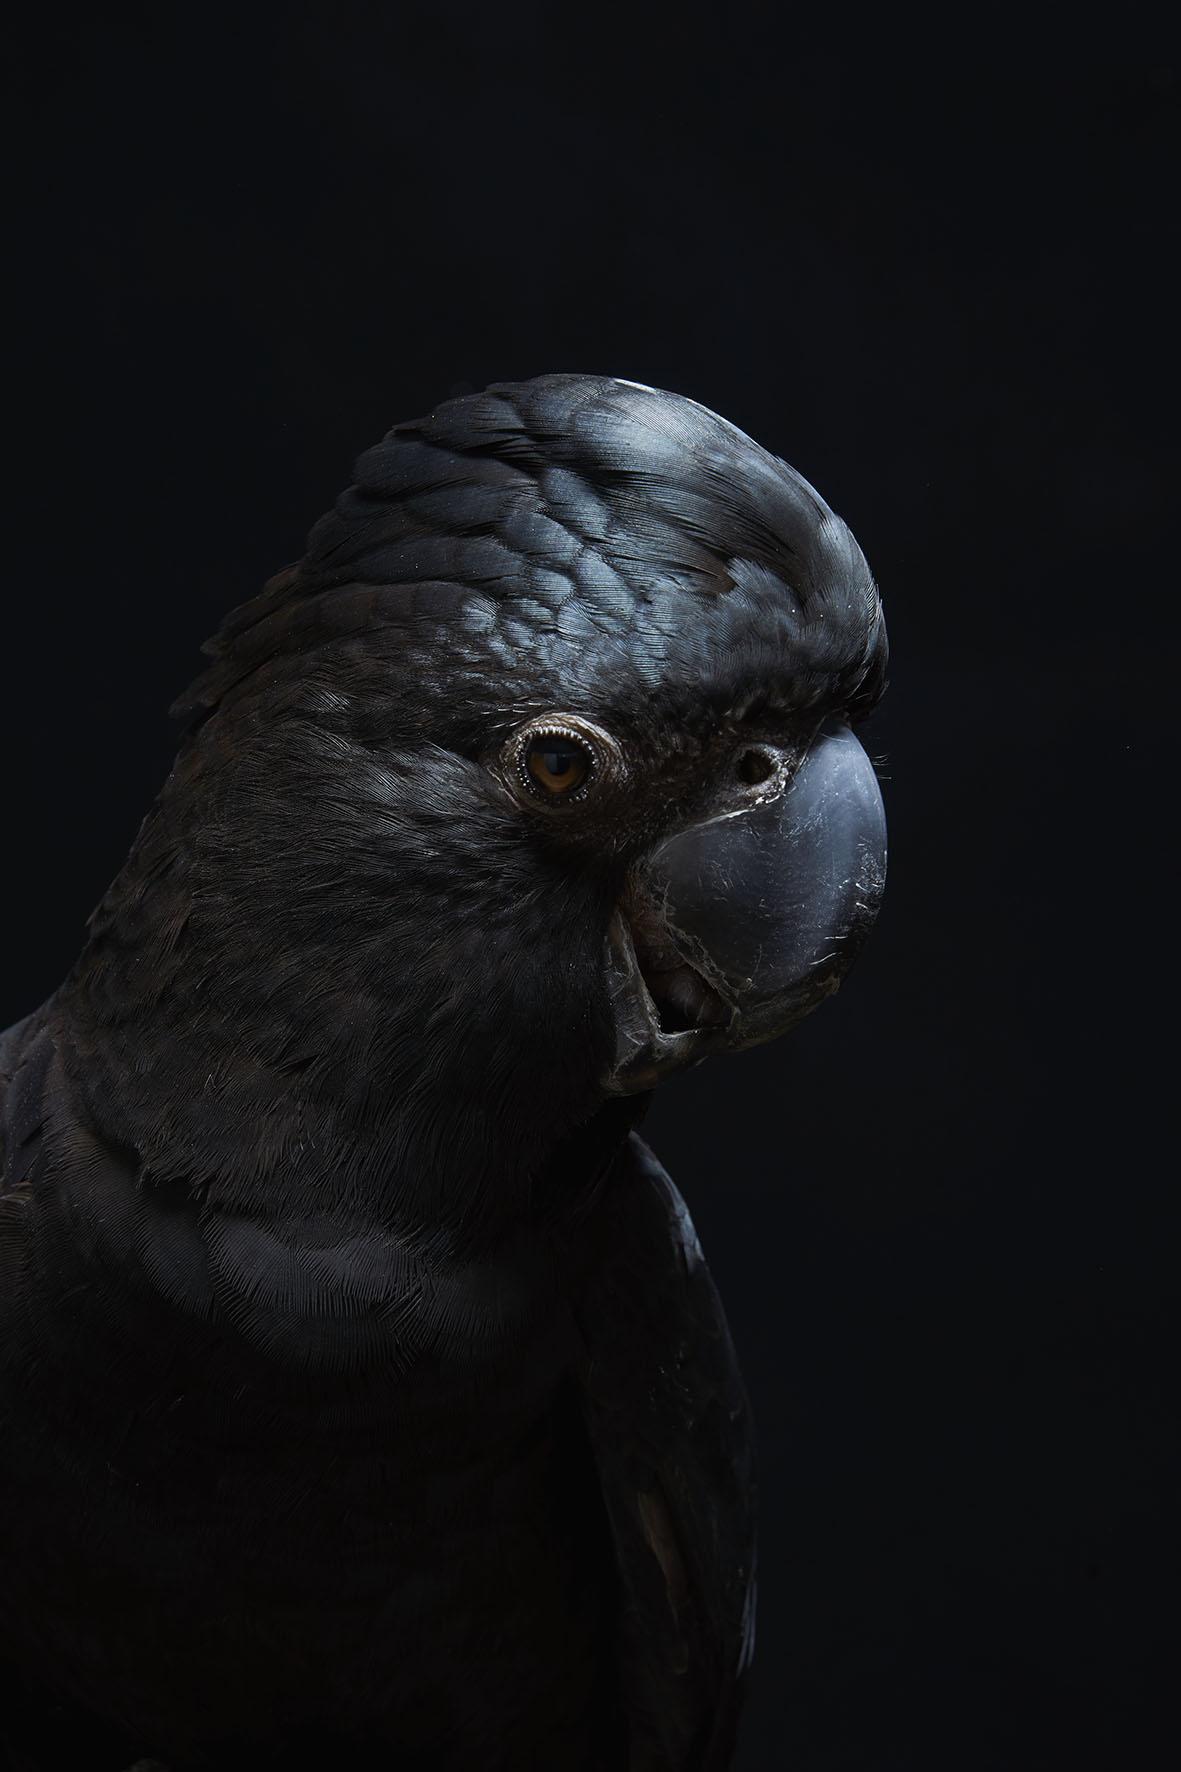 Cockatoo_Redtailed_Black_M_048.jpg